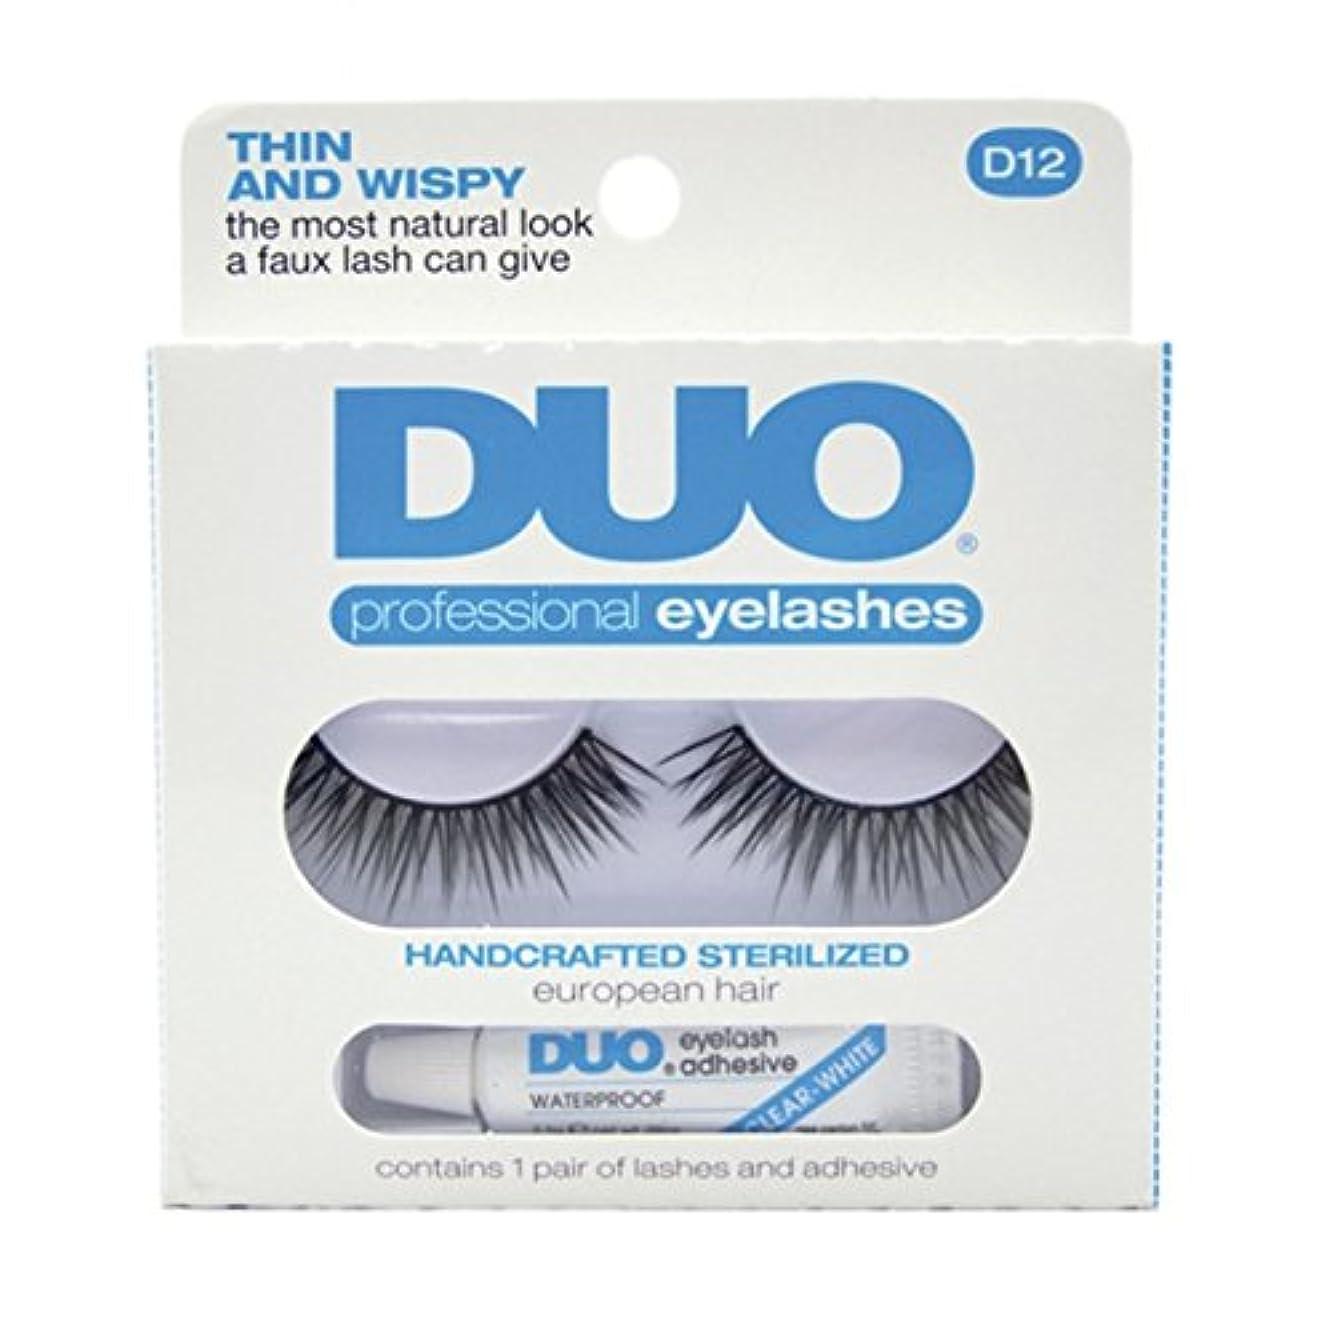 DUO Eyelash Adhesive Think and Wispy D12 Eyelashes Thin and Wispy (並行輸入品)